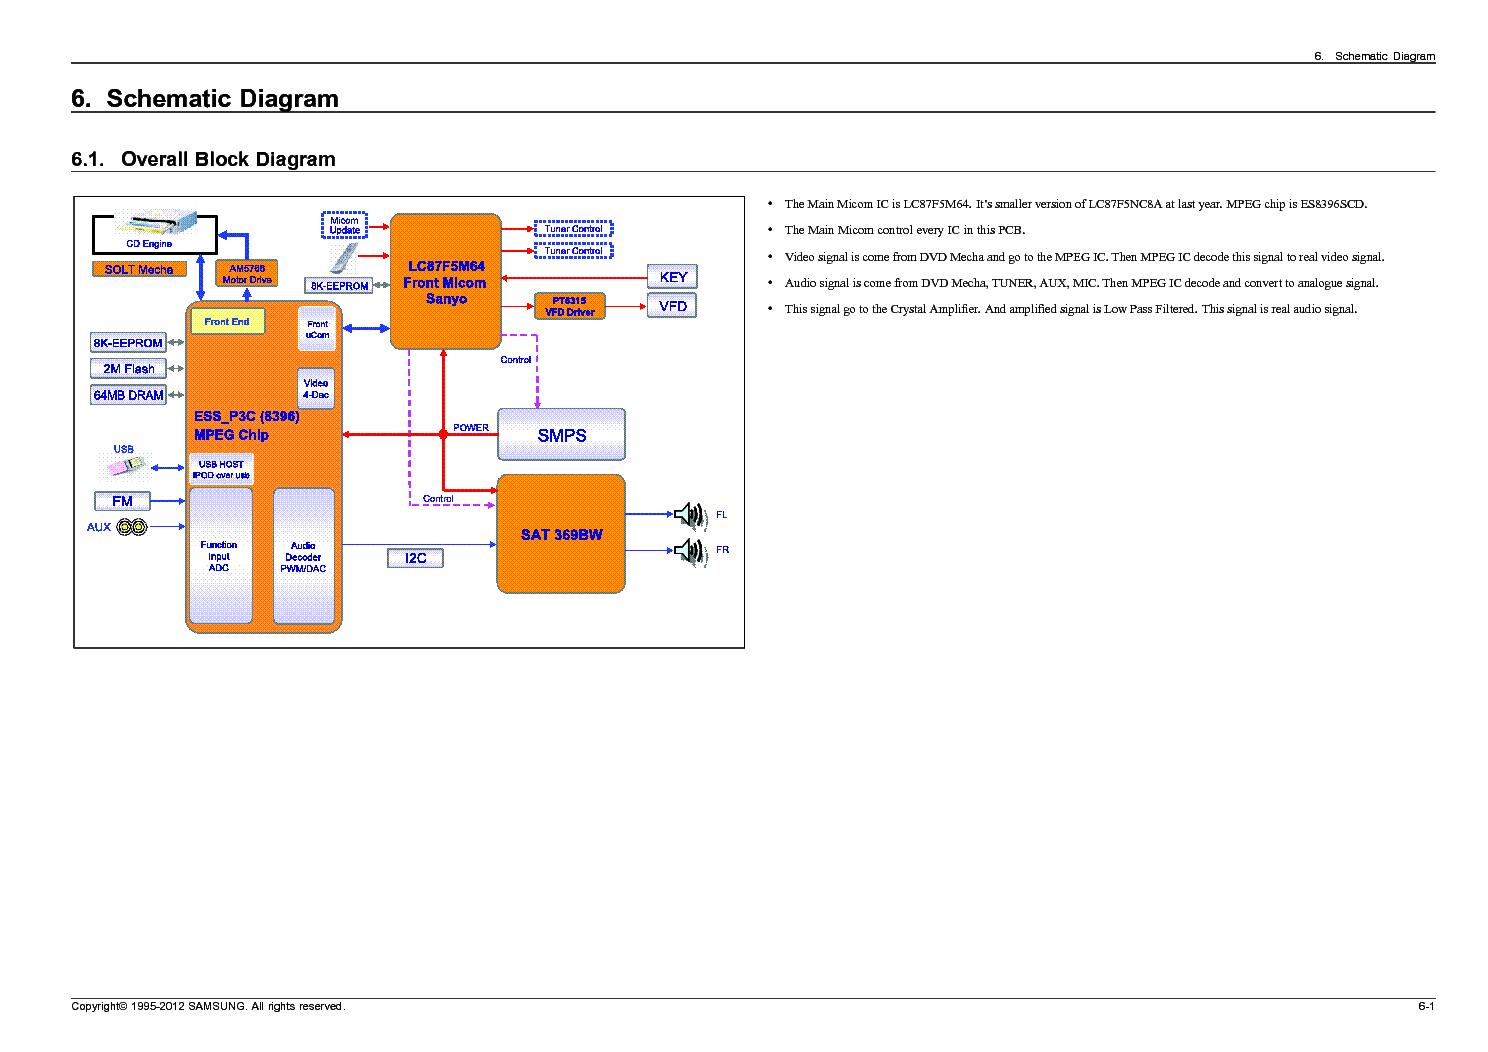 SAMSUNG MM-E320 SCH service manual (1st page)